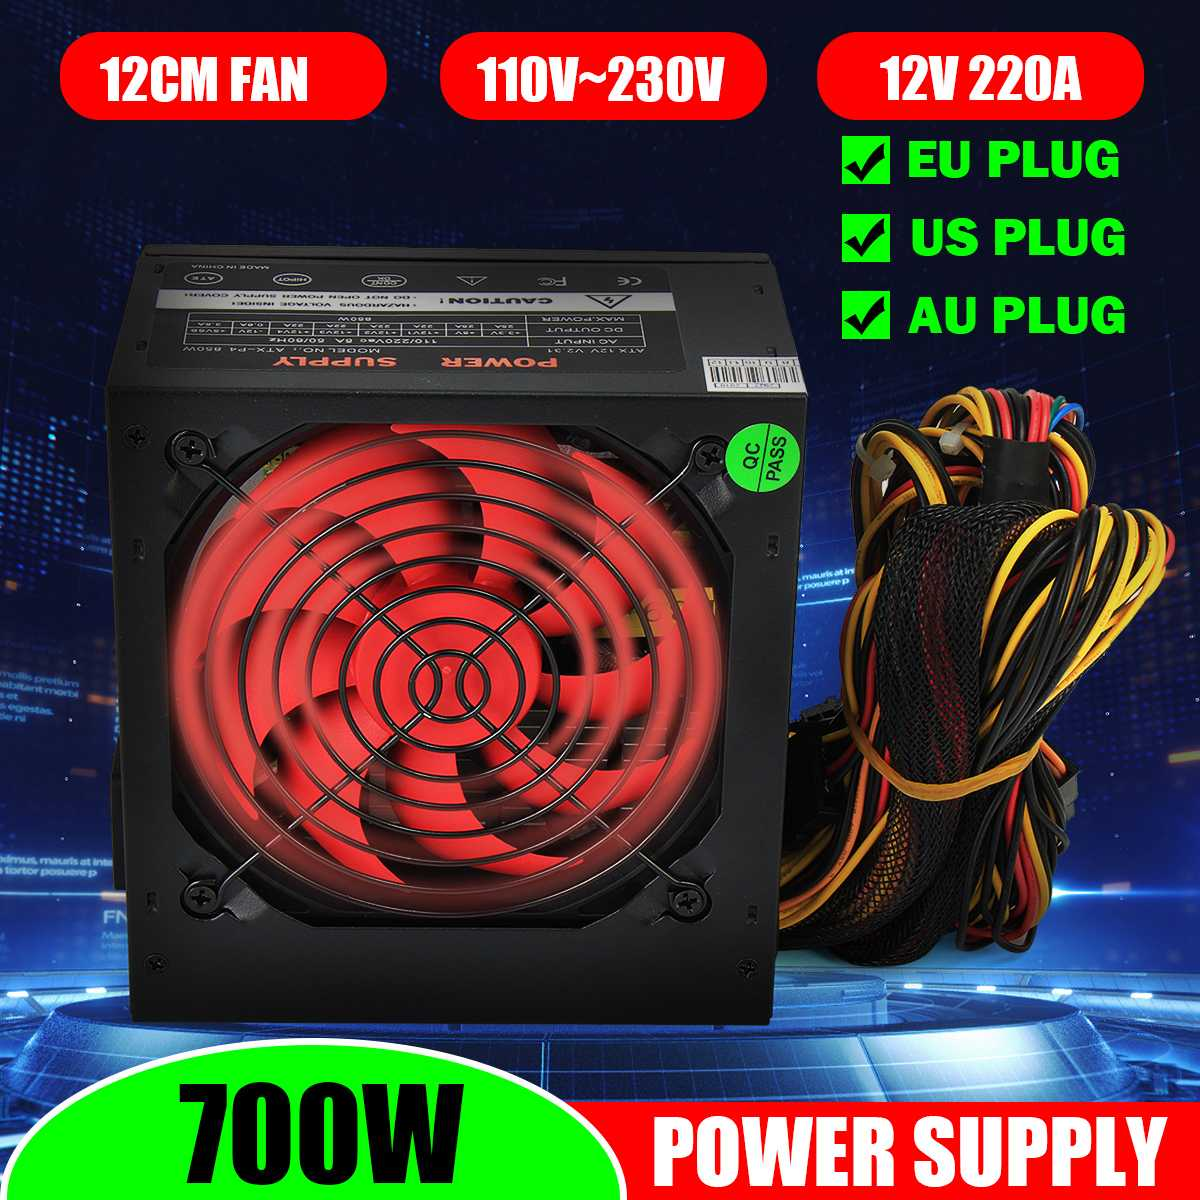 PSU PFC 700 W Watt ventilateur silencieux ATX 24 broches 12CM PC ordinateur alimentation 80 +